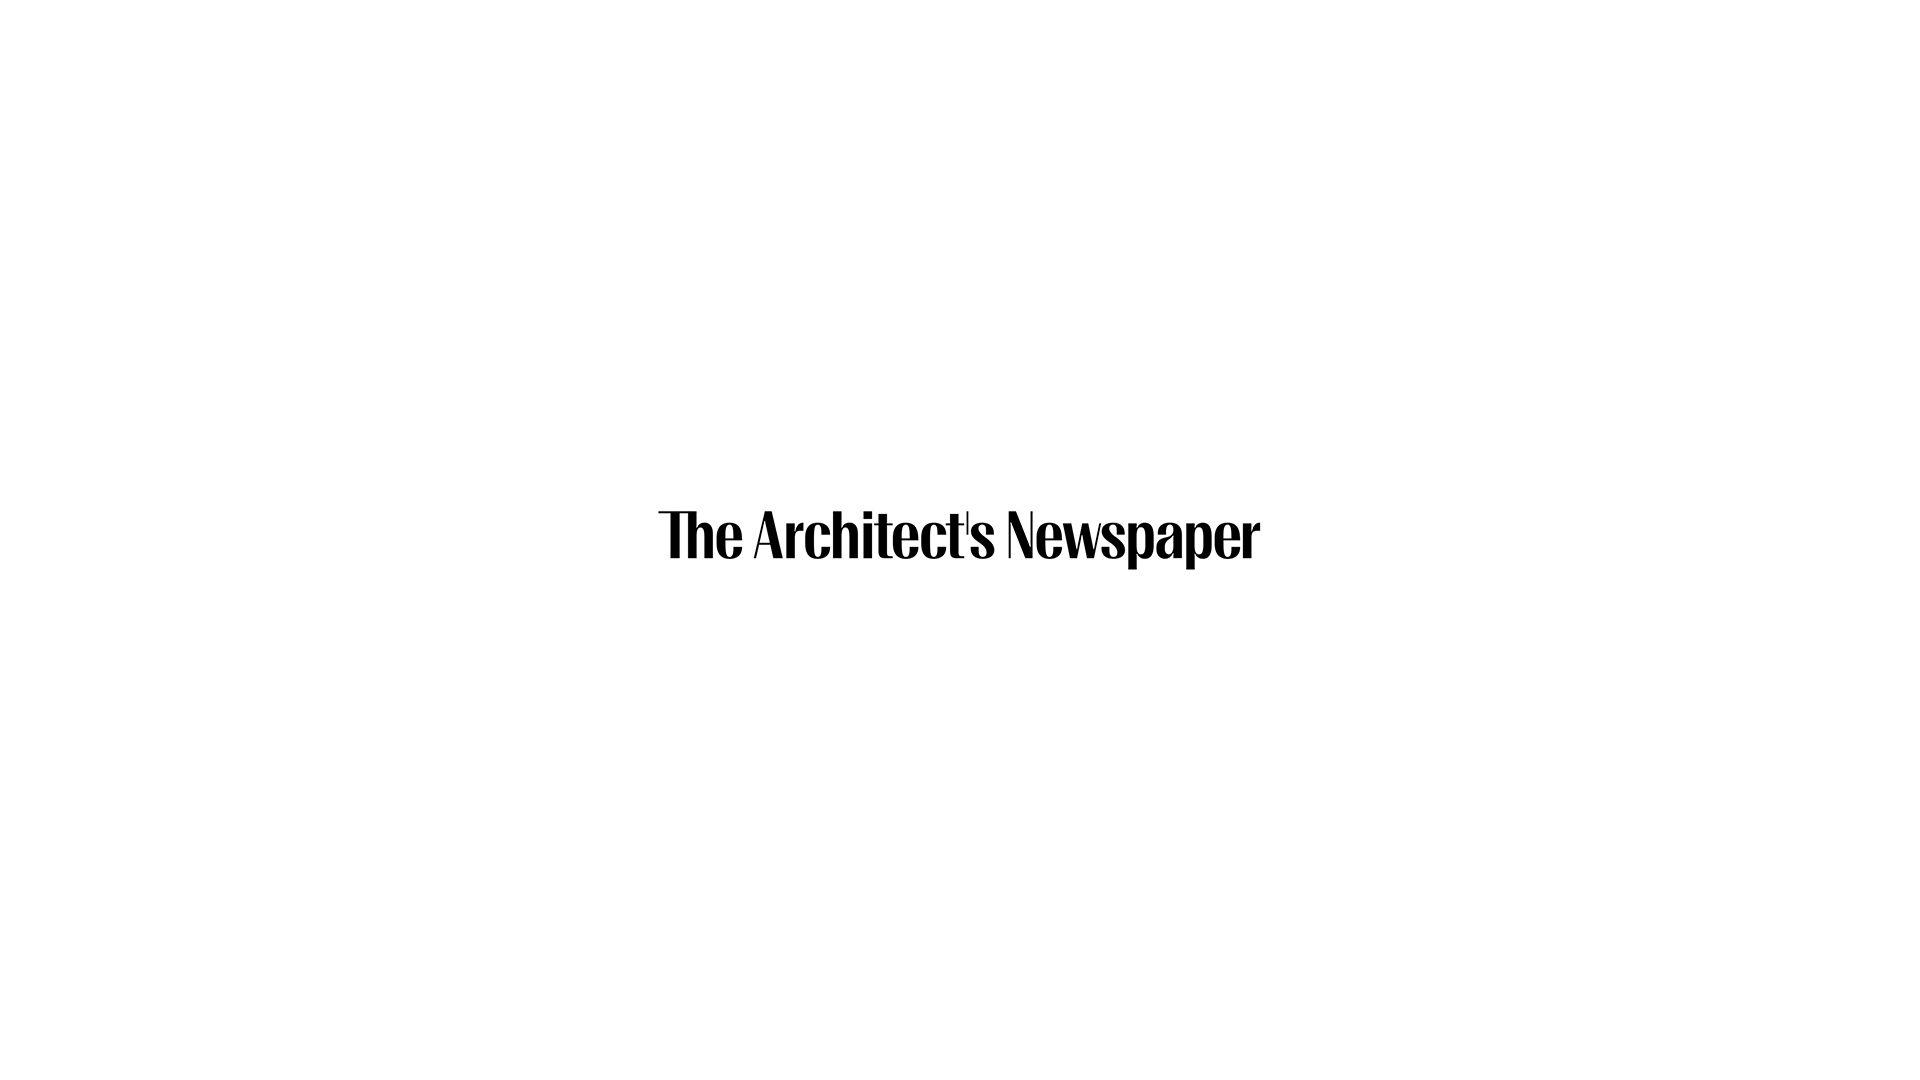 The Architect's Newspaper logo